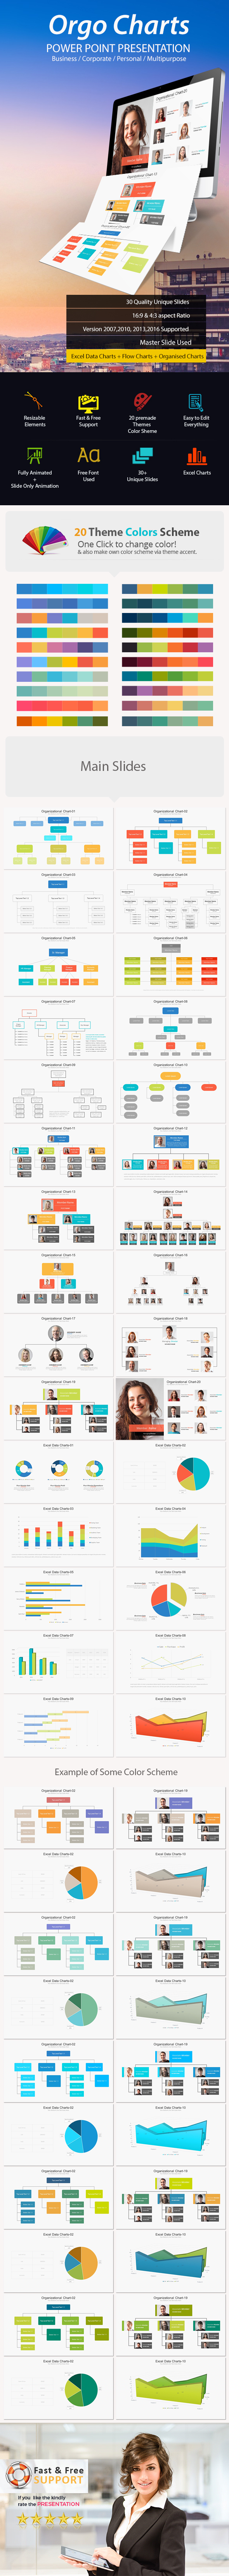 Orgo Charts Power Point Presentation